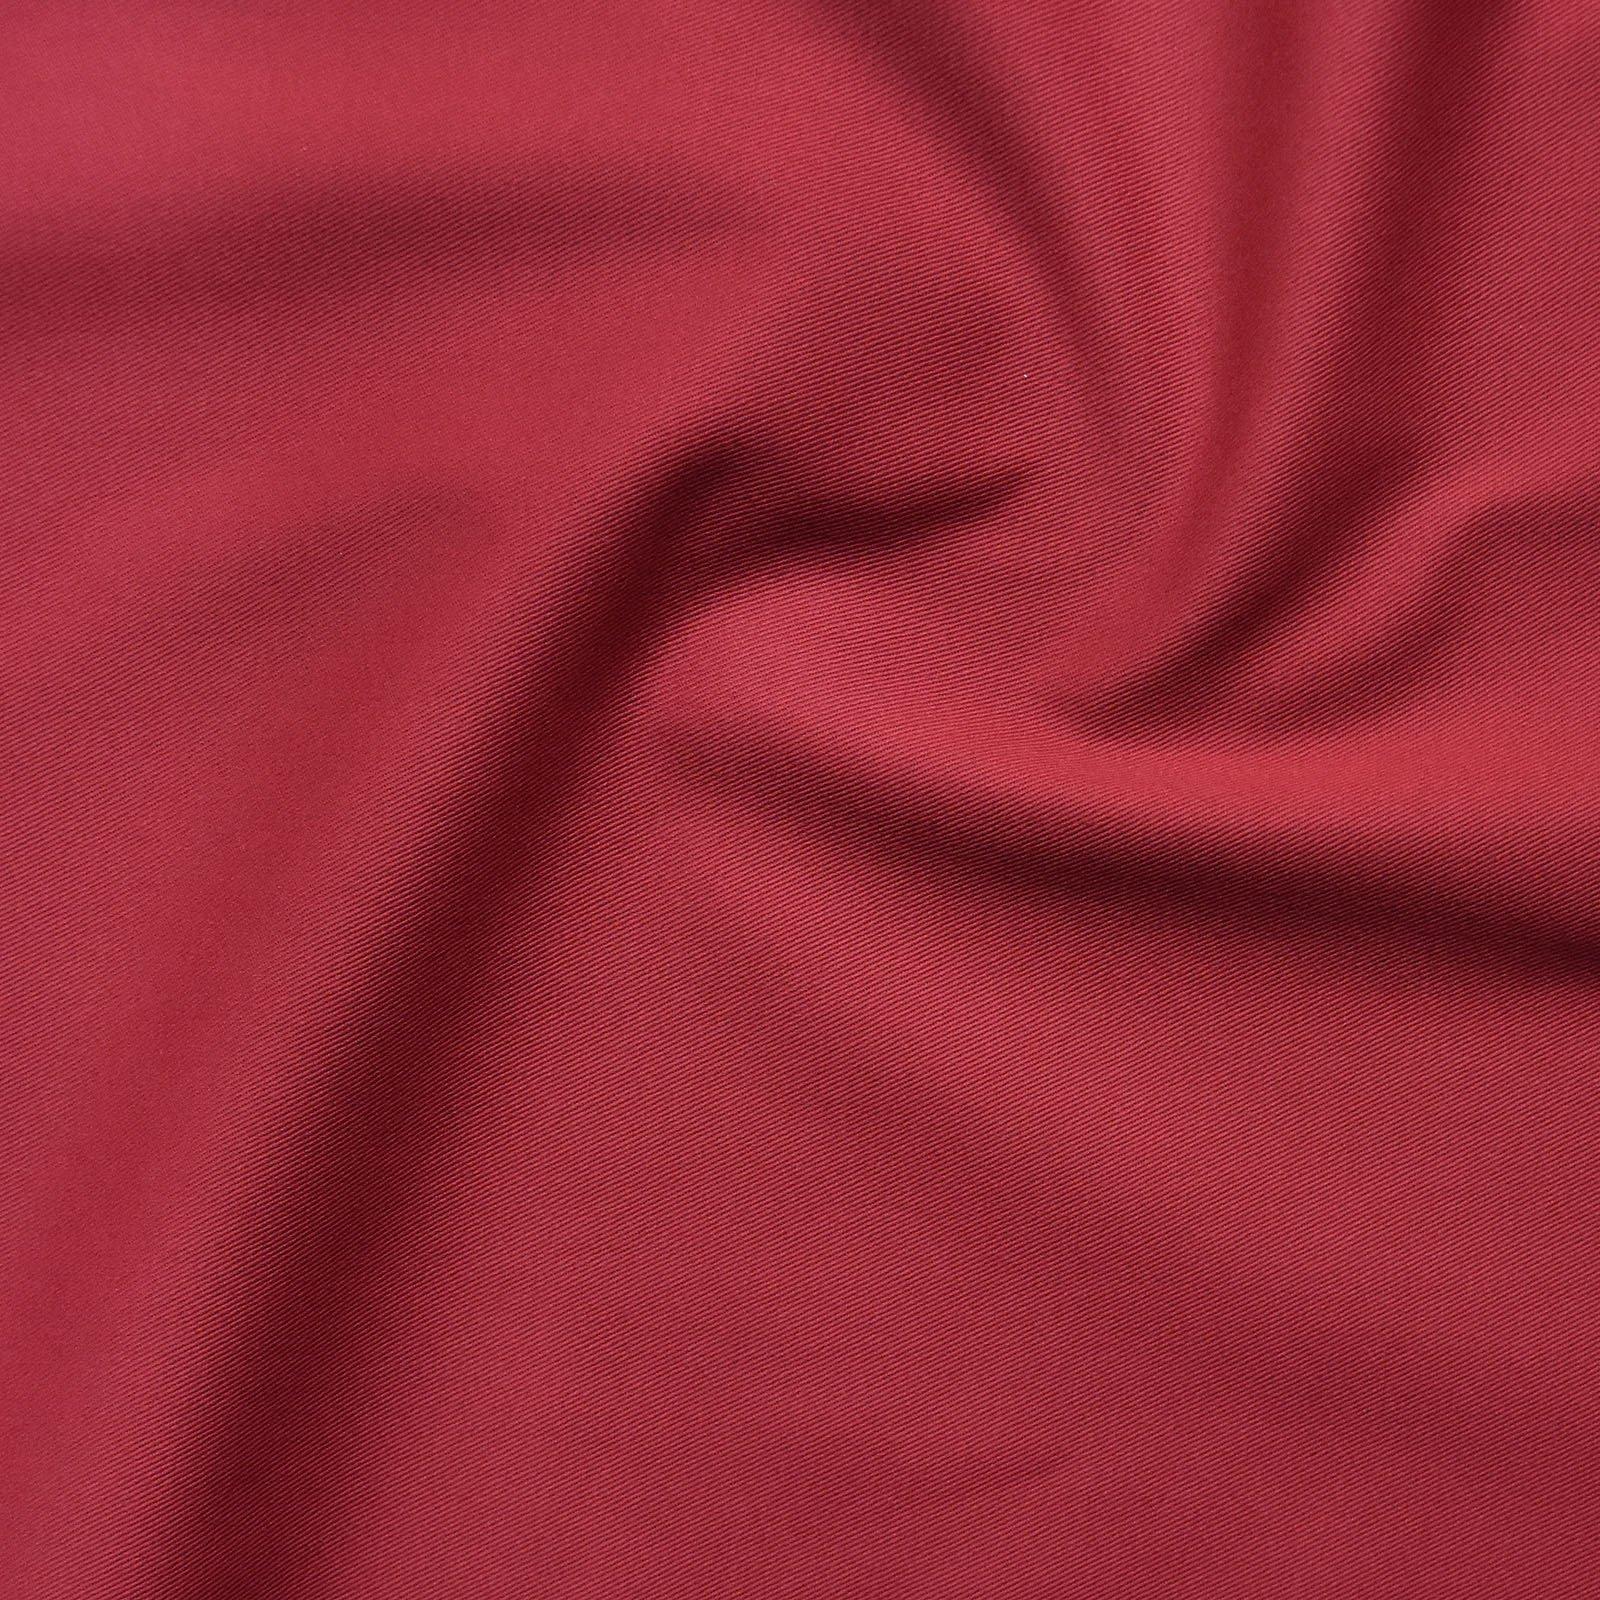 Chino Twill - Deep Red